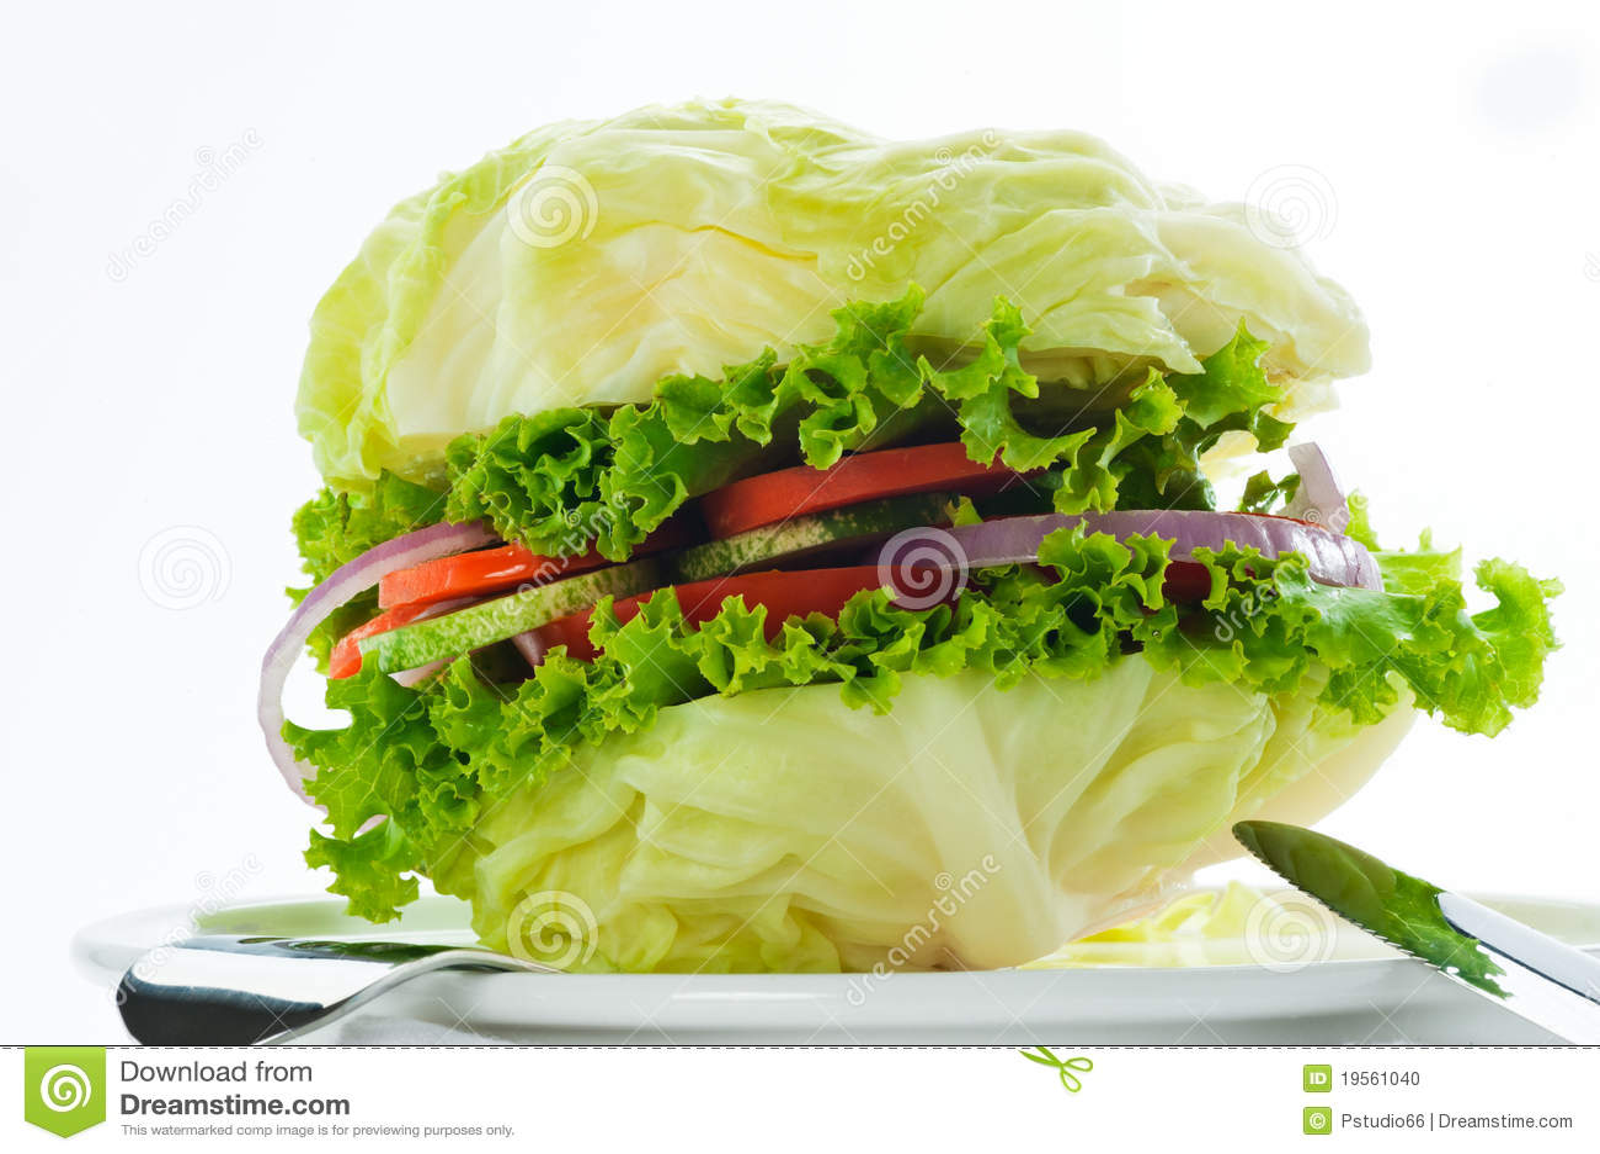 Hamburguesa vegetariana foto de archivo imagen 19561040 - Hacer hamburguesas vegetarianas ...